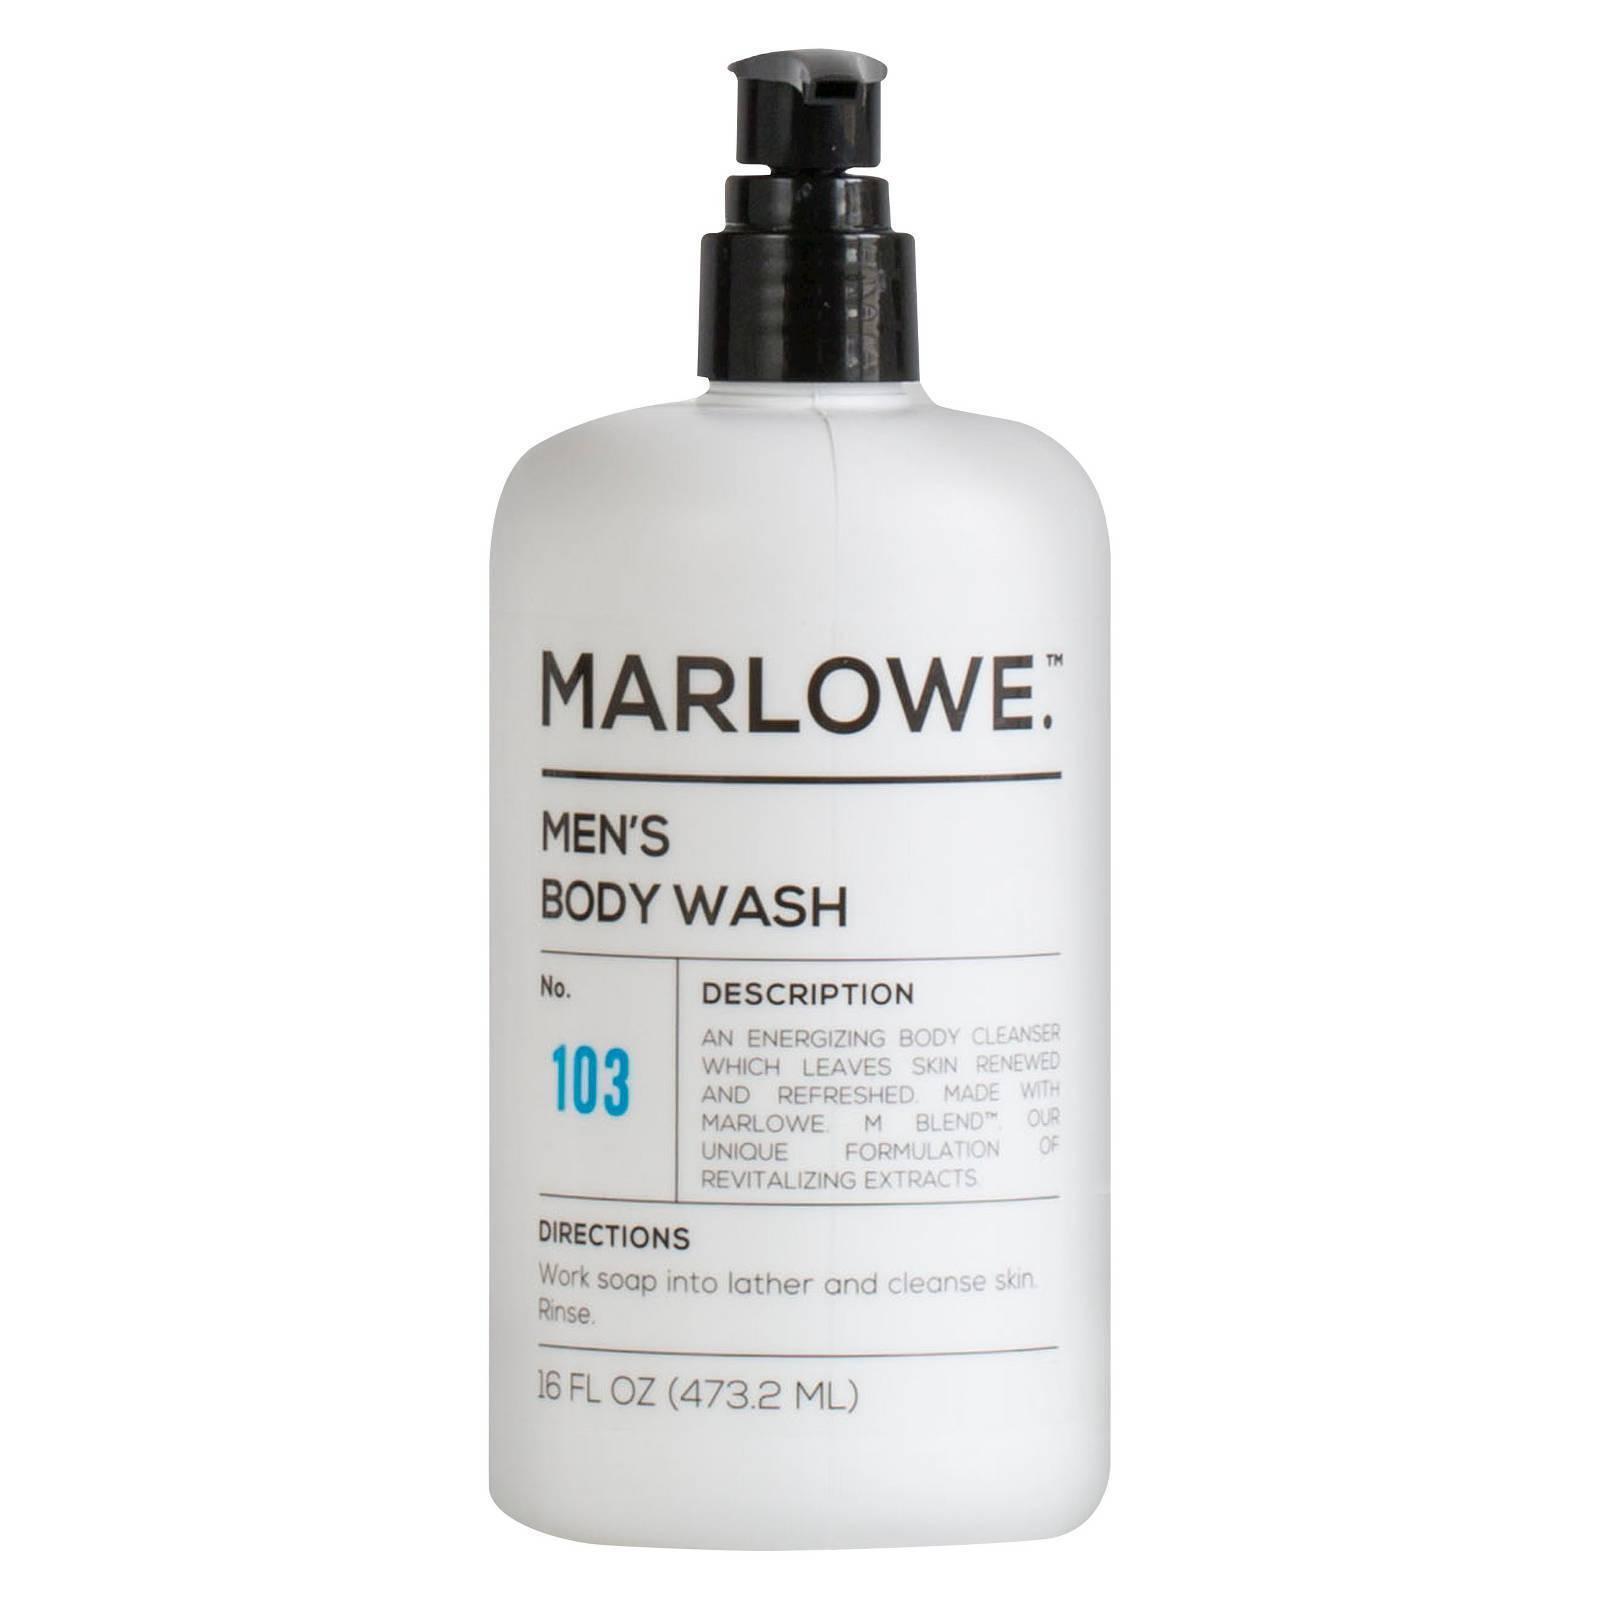 Marlowe Men S Body Wash No 103 16 Fl Oz For Sale Online Ebay